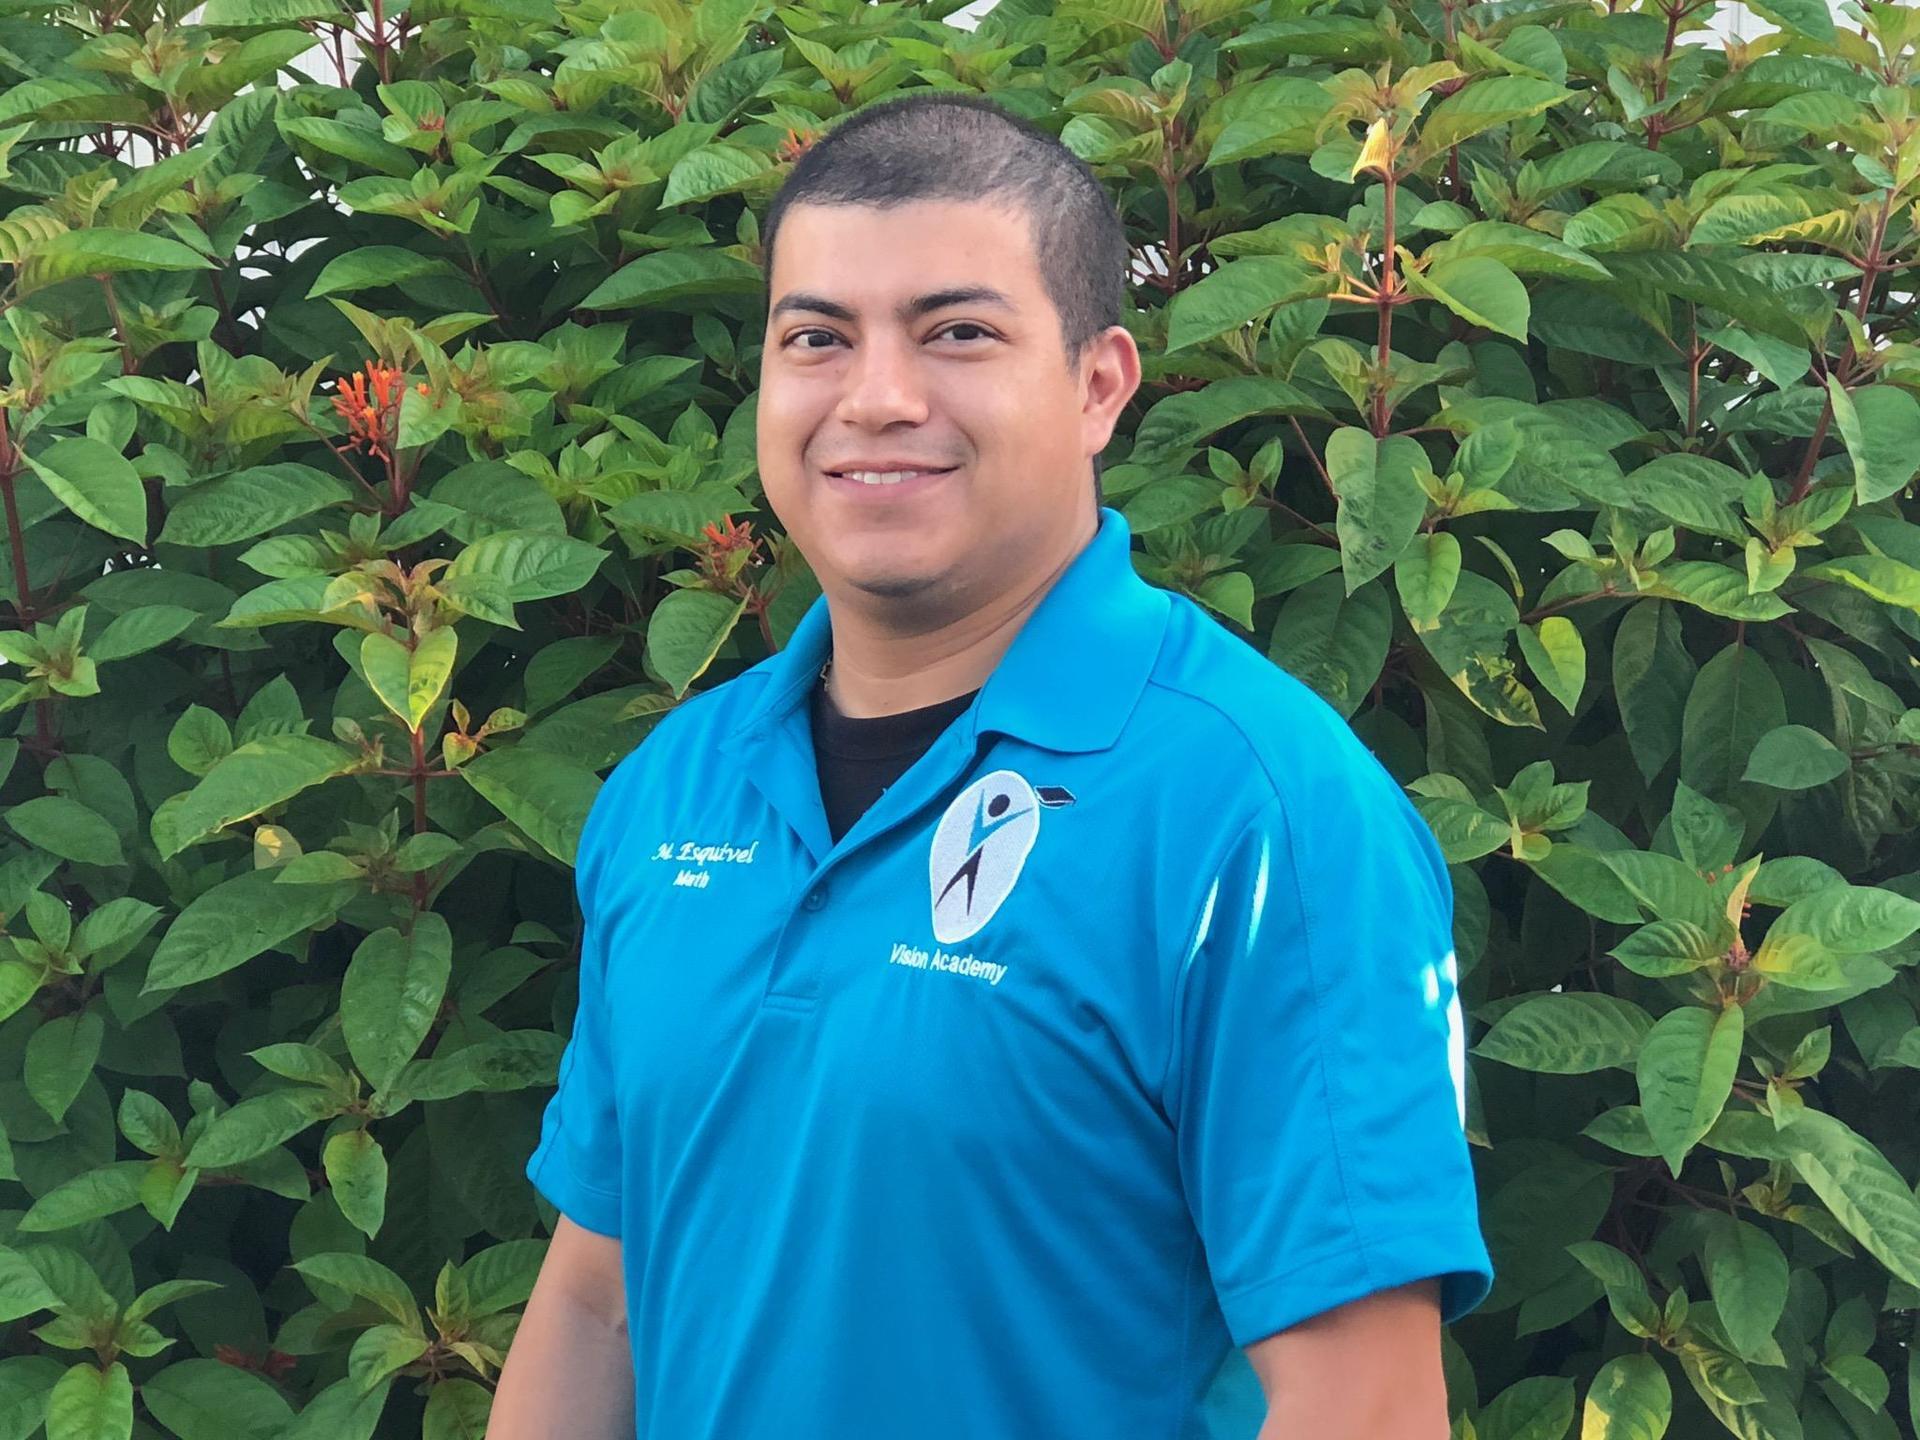 M. Esquivel History Teacher